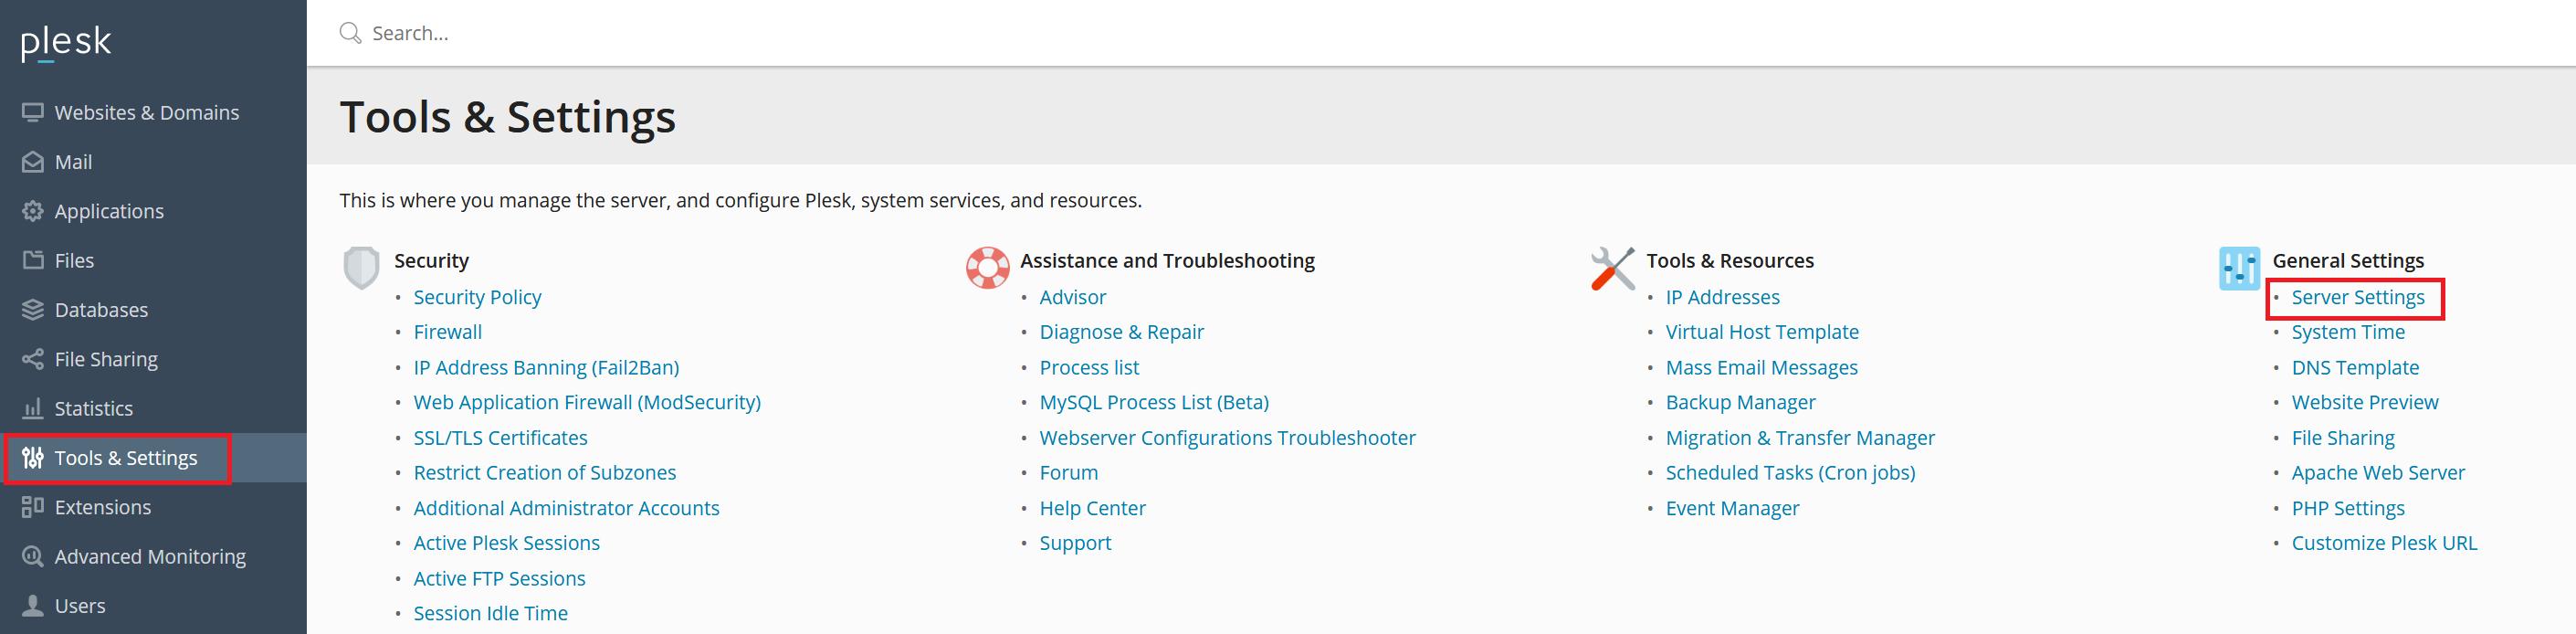 plesk general settings server settings